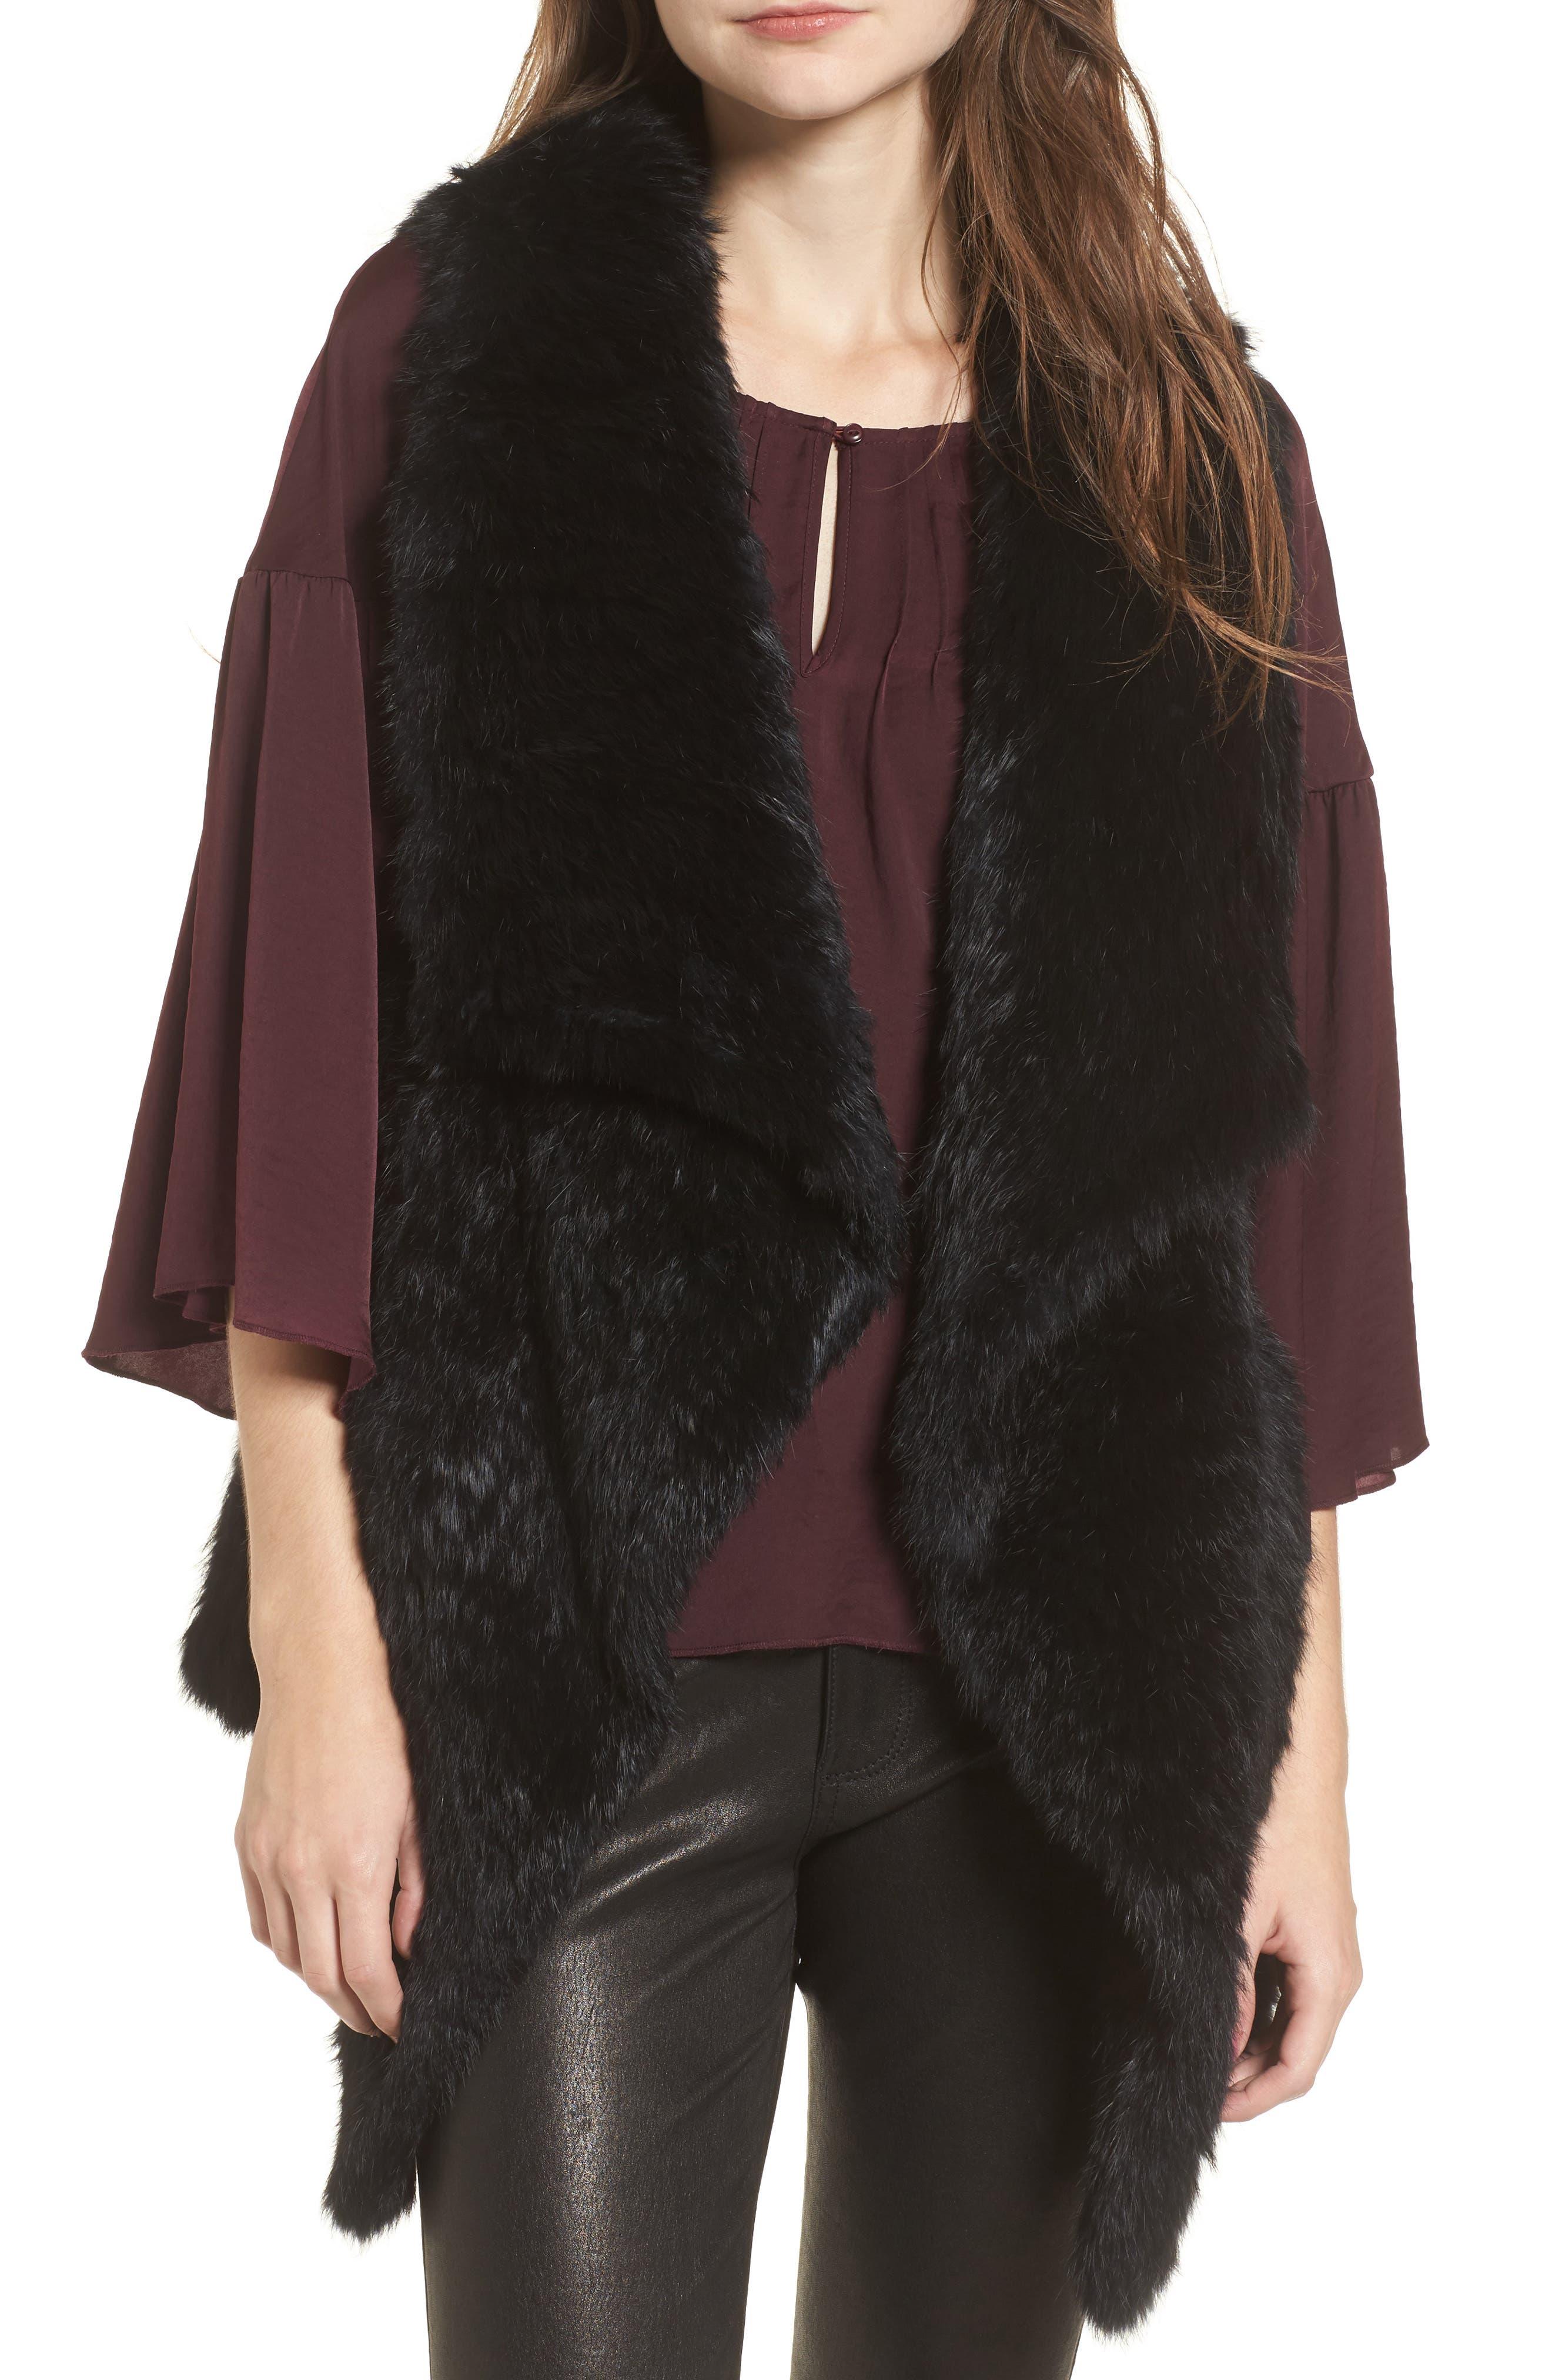 Alternate Image 1 Selected - Love Token Long Drape Genuine Rabbit Fur Vest